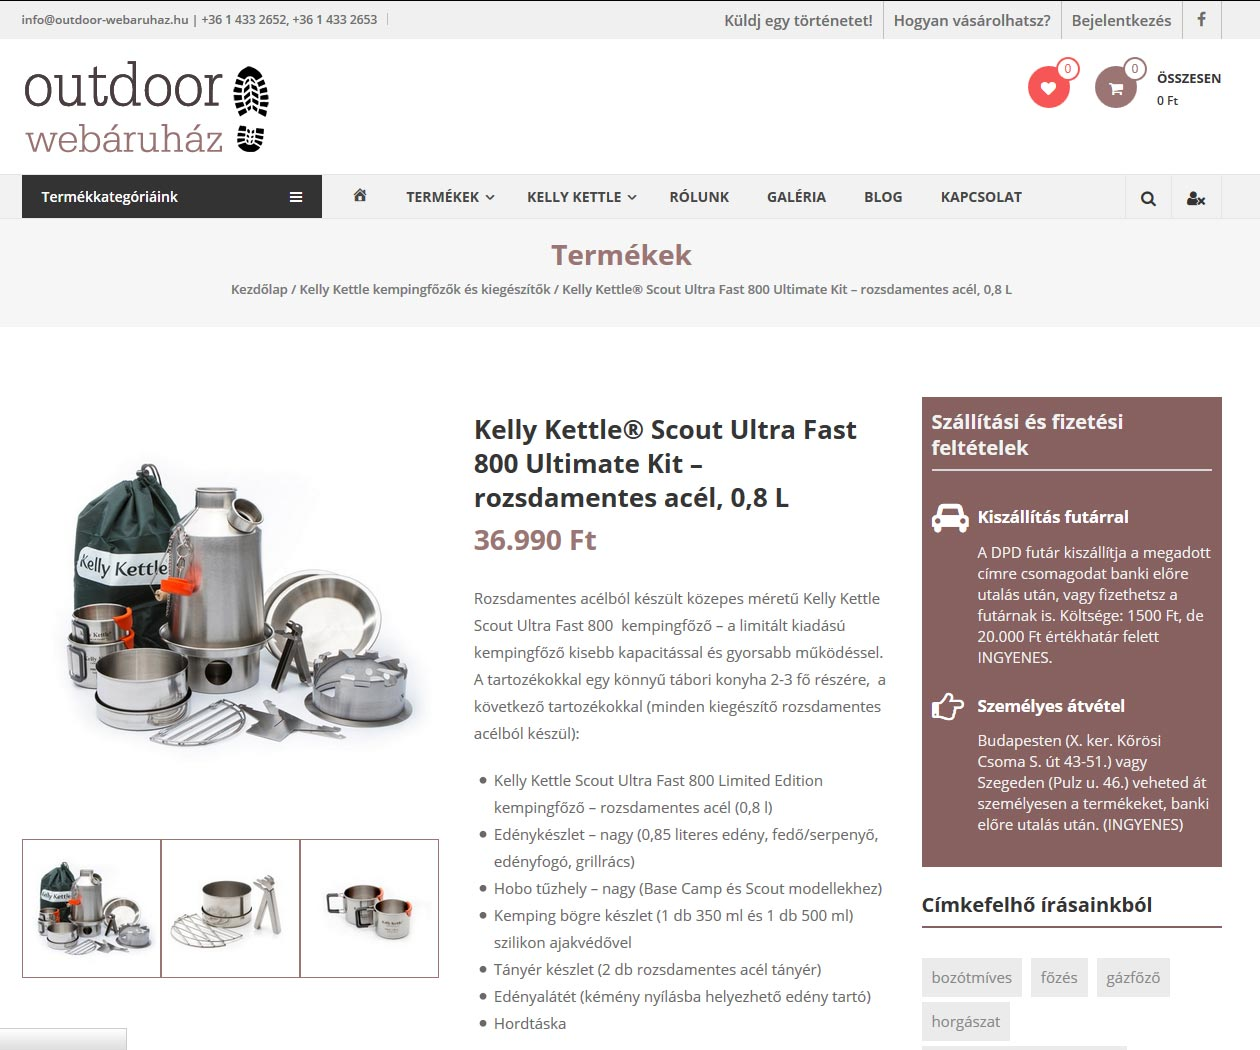 outdoor-webaruhaz-termek